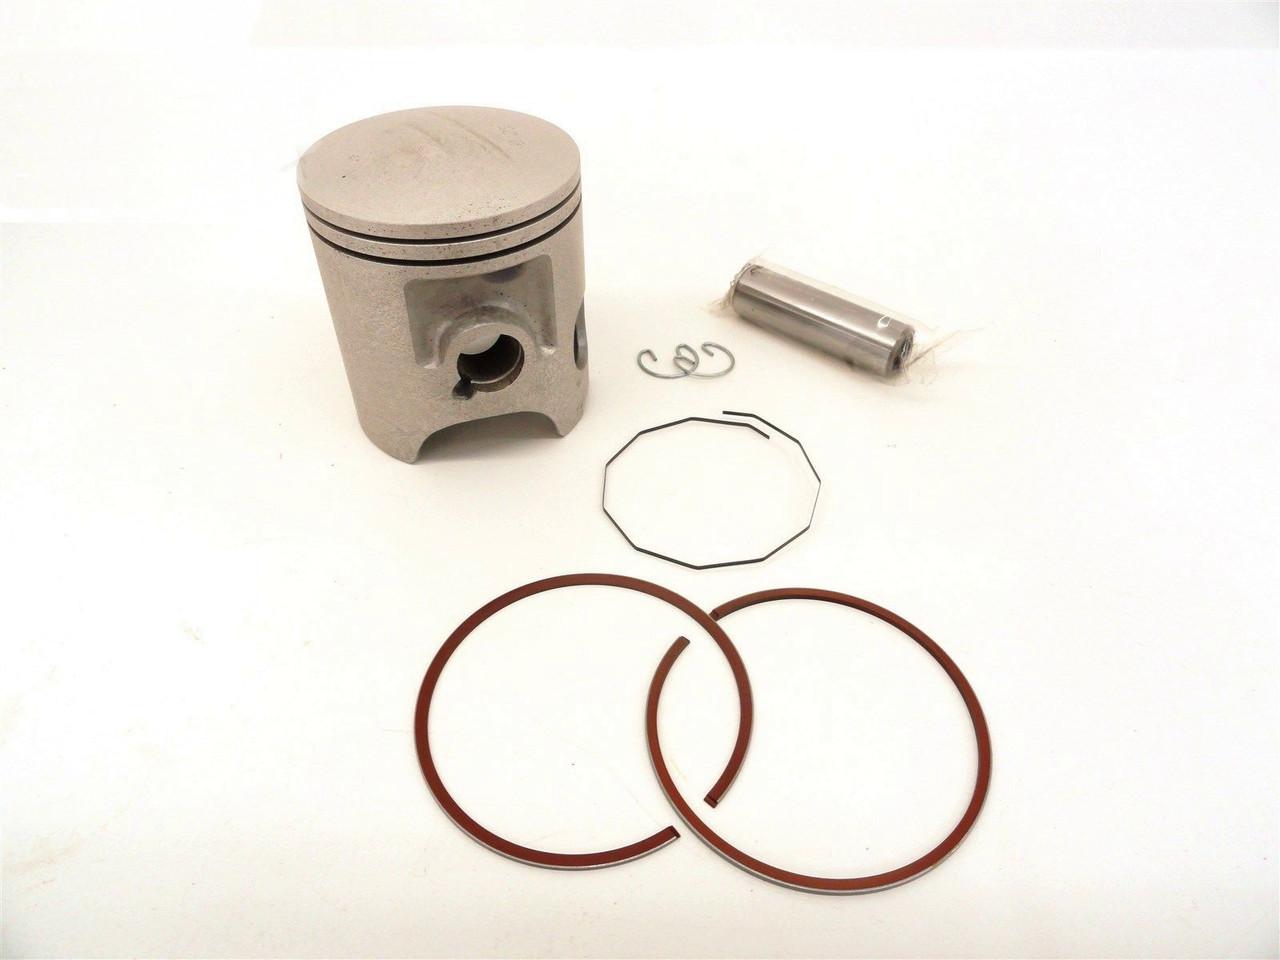 medium resolution of cylinder piston rings 25mm over bore 64 25mm yamaha 87 06 yfz 350 banshee cyclesrus net